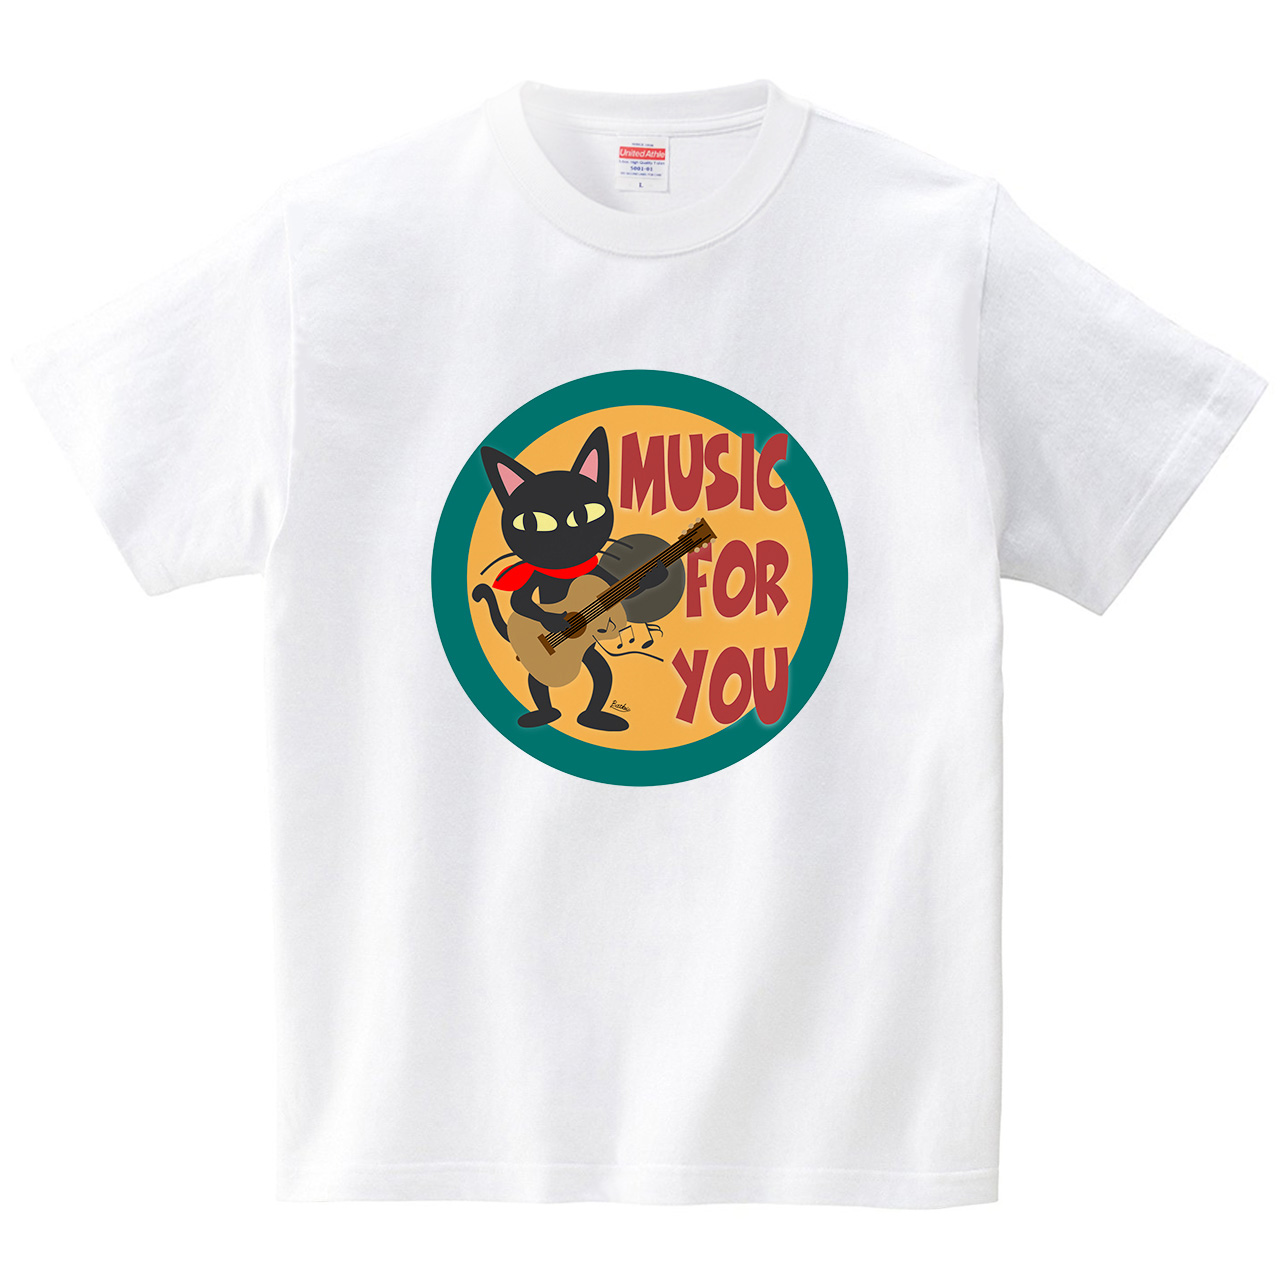 Music for you(Tシャツ・ホワイト)(BATKEI)